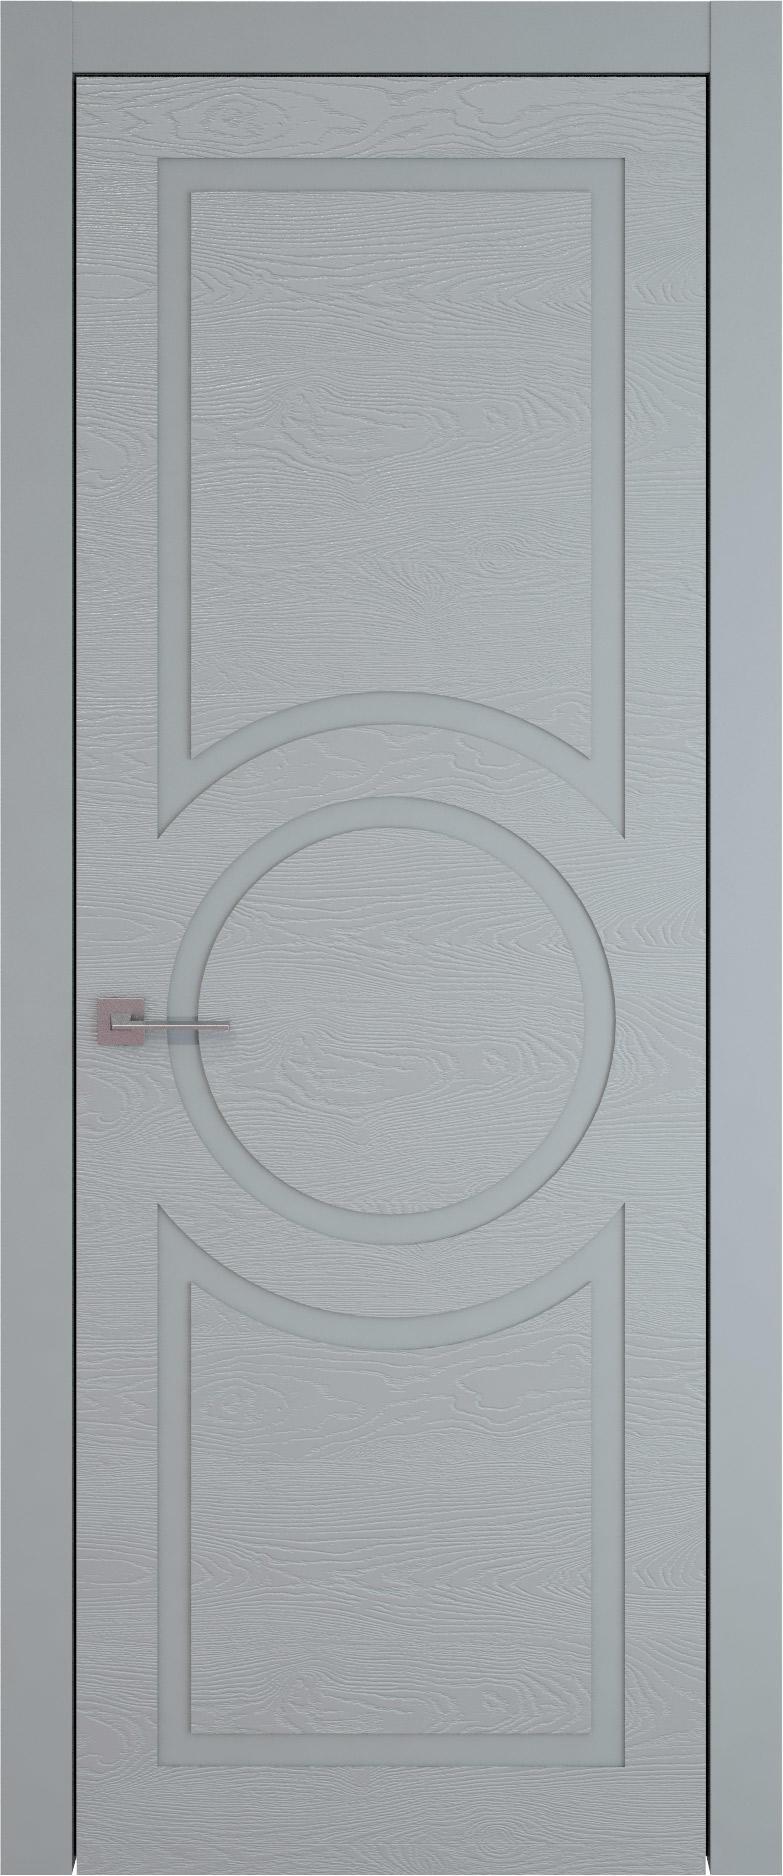 Tivoli М-5 цвет - Серебристо-серая эмаль по шпону (RAL 7045) Без стекла (ДГ)